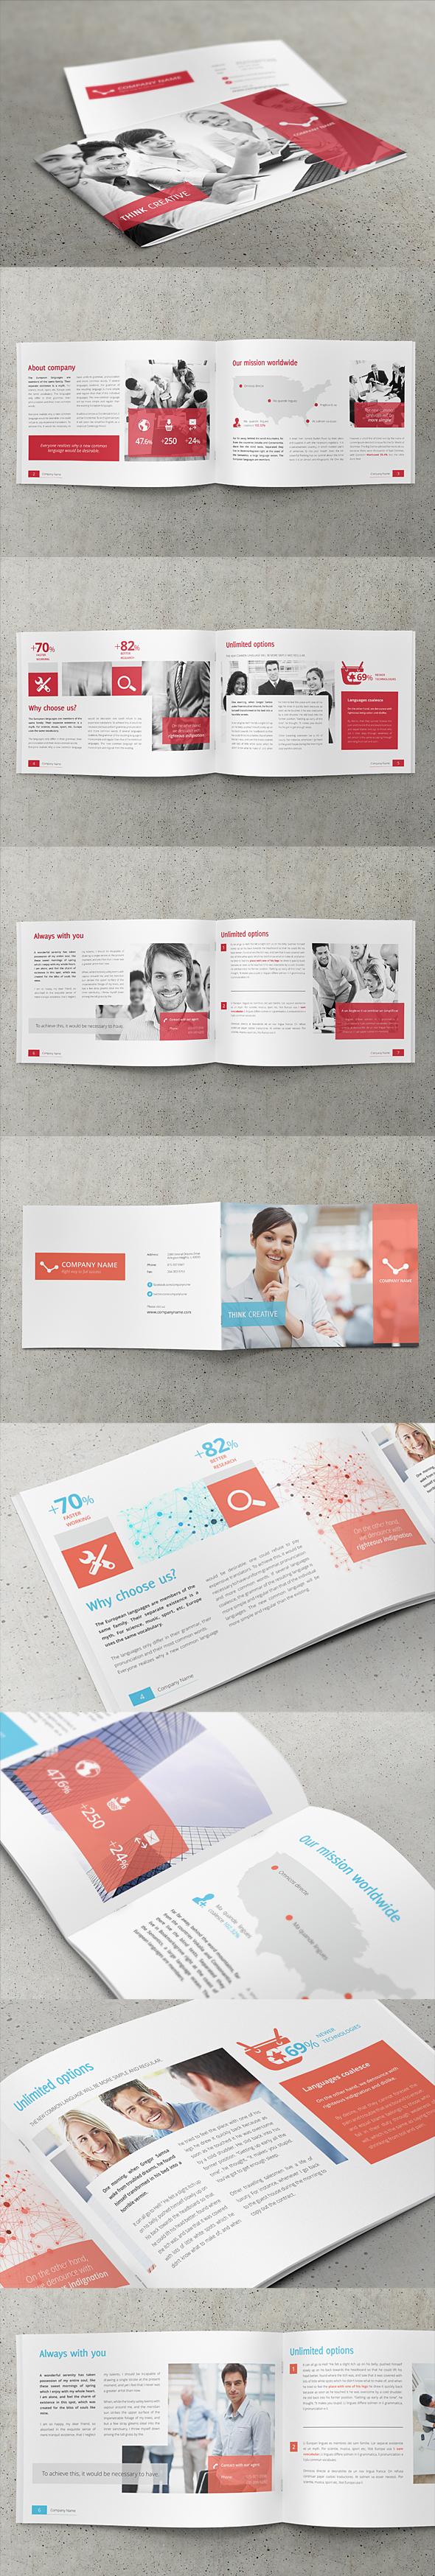 Business, Corporate Multipurpose A4 Brochure #2 by Przemyslaw S, via Behance